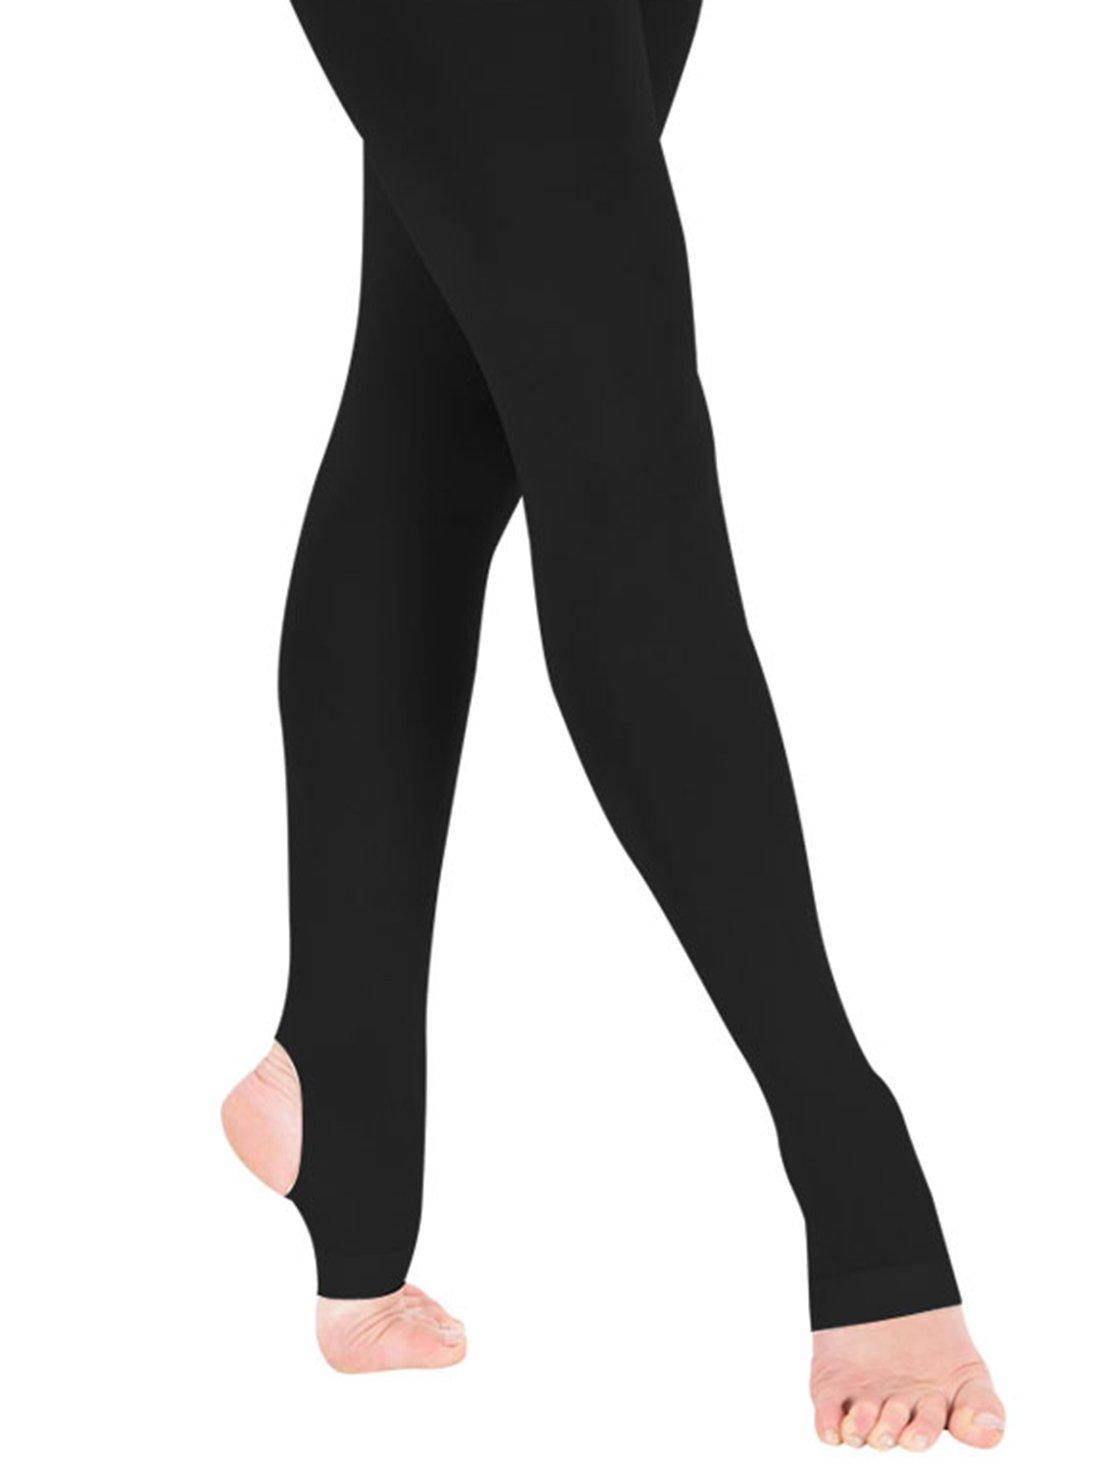 Kids Girls Transition Tight Ballet Dance Stockings Cotton Strecth Legging, Black, Medium by FEOYA